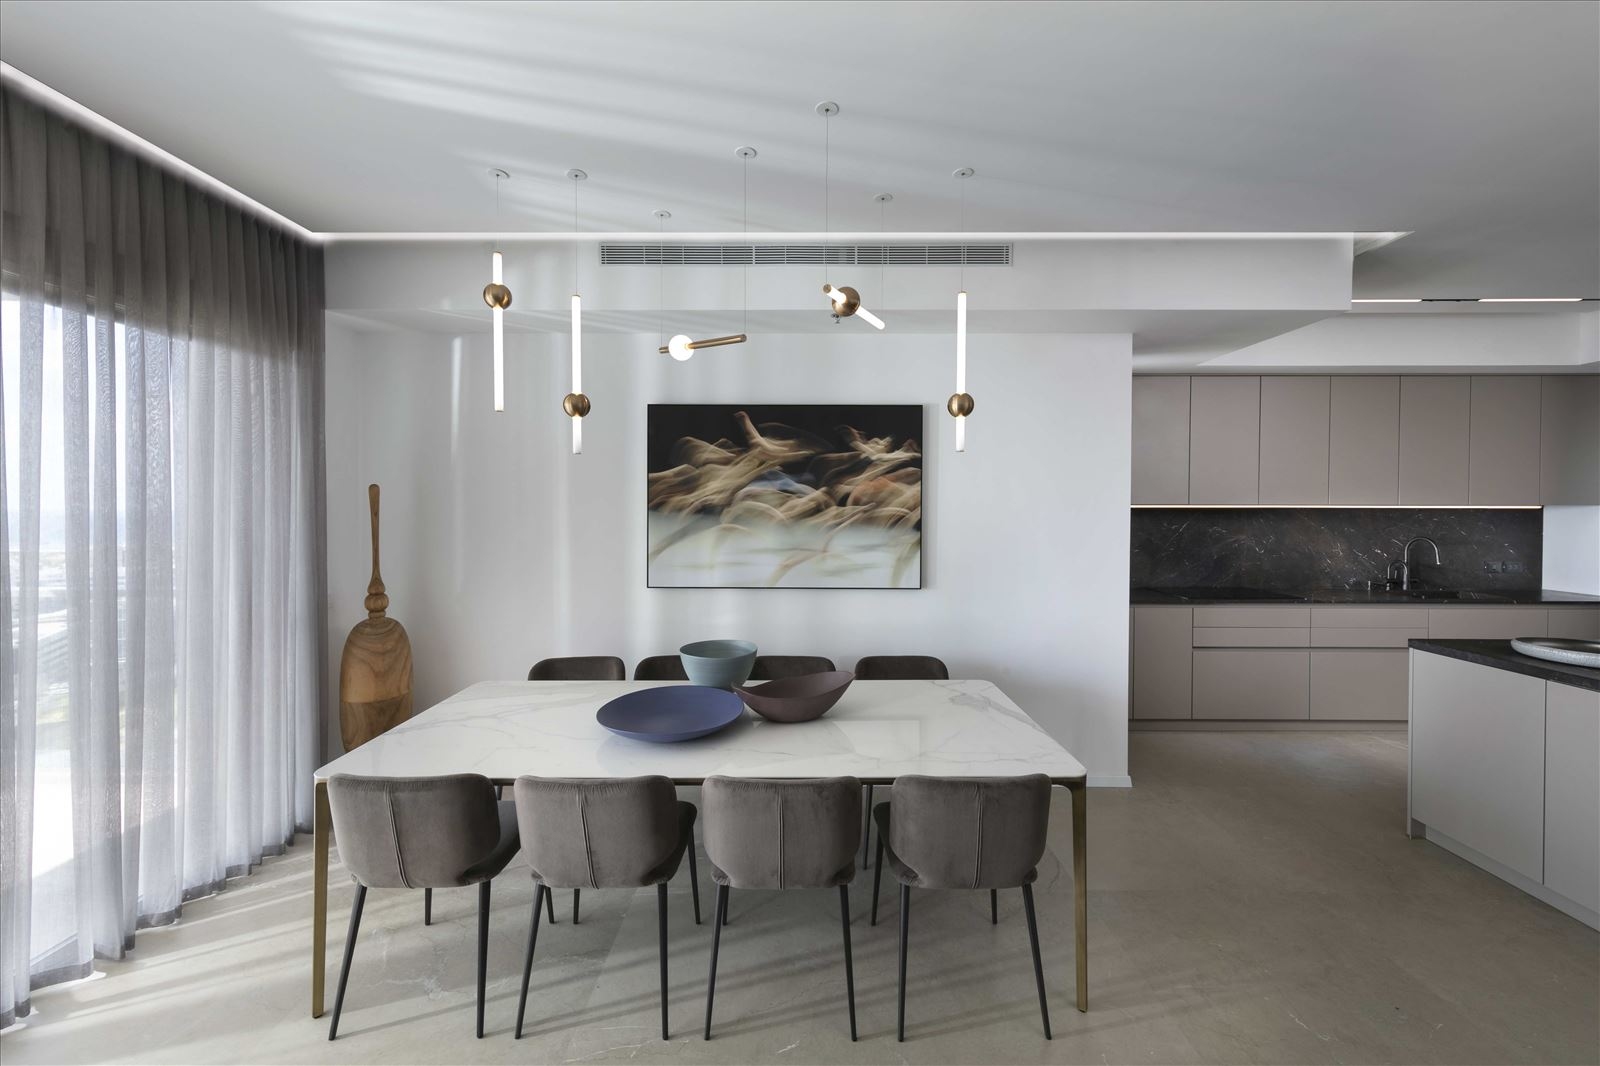 Private home - Herzliya תאורה בפינת אוכל על ידי קמחי תאורה